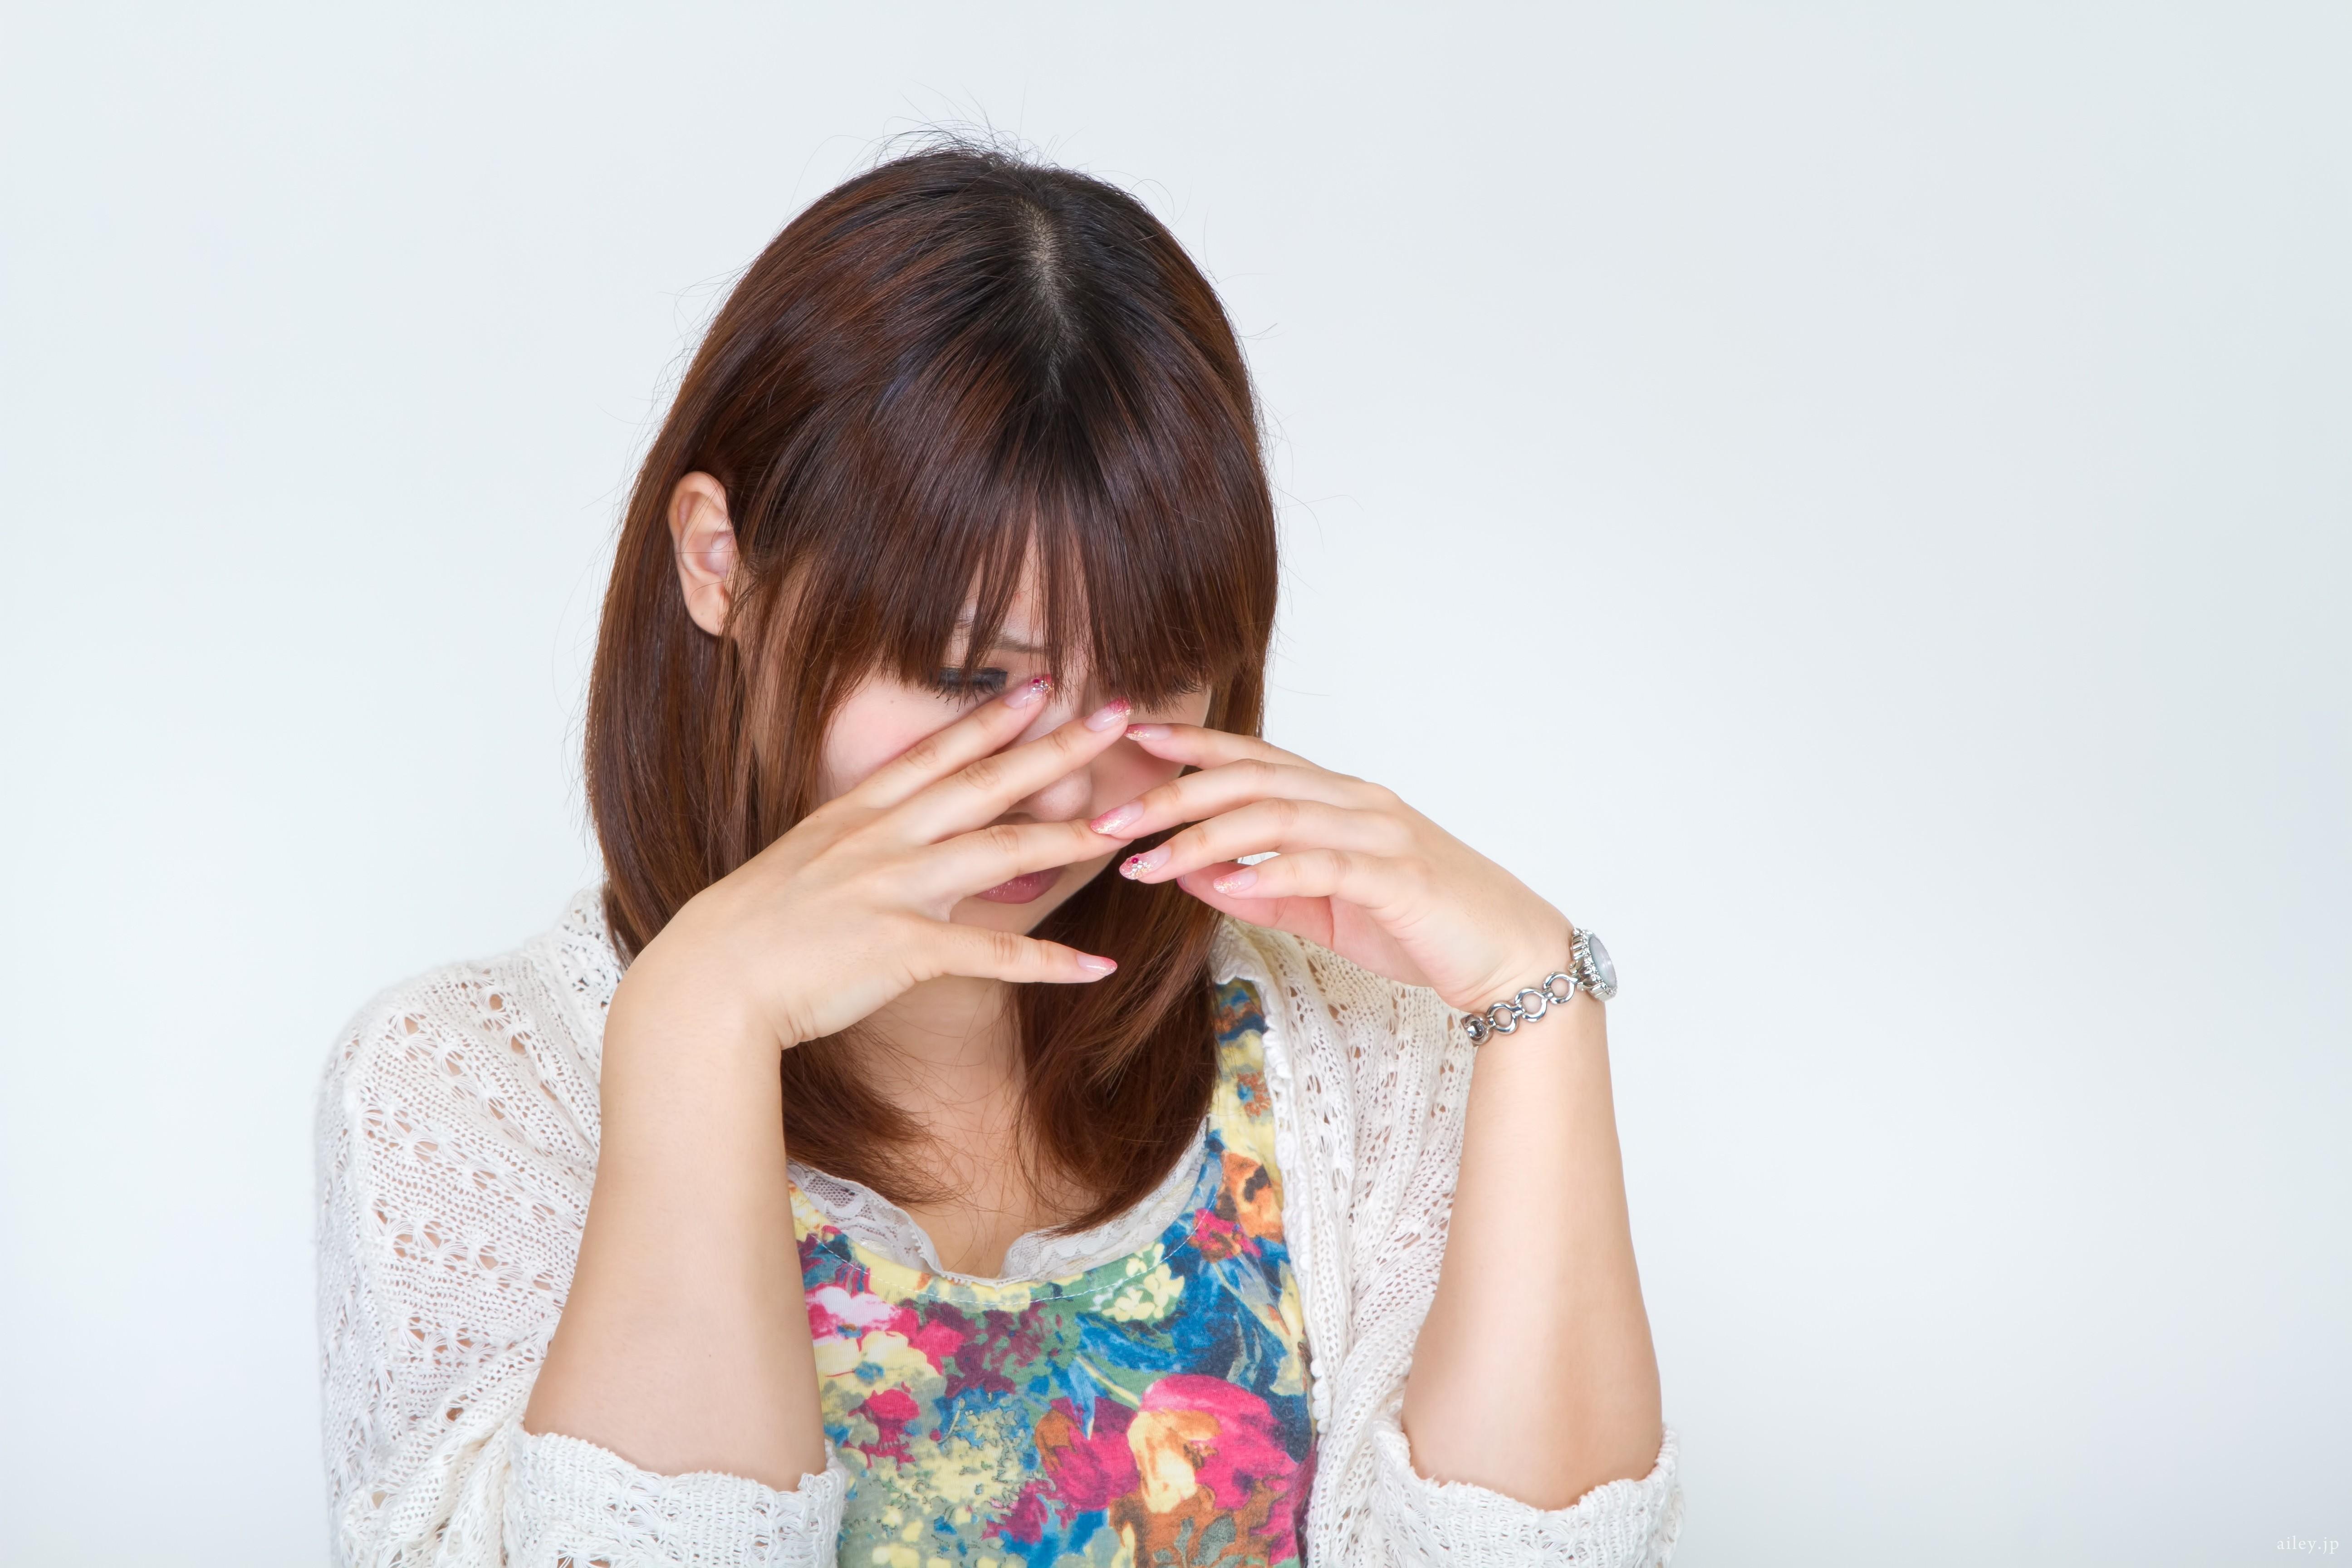 www-pakutaso-com-shared-img-thumb-n112_kanashiinamida